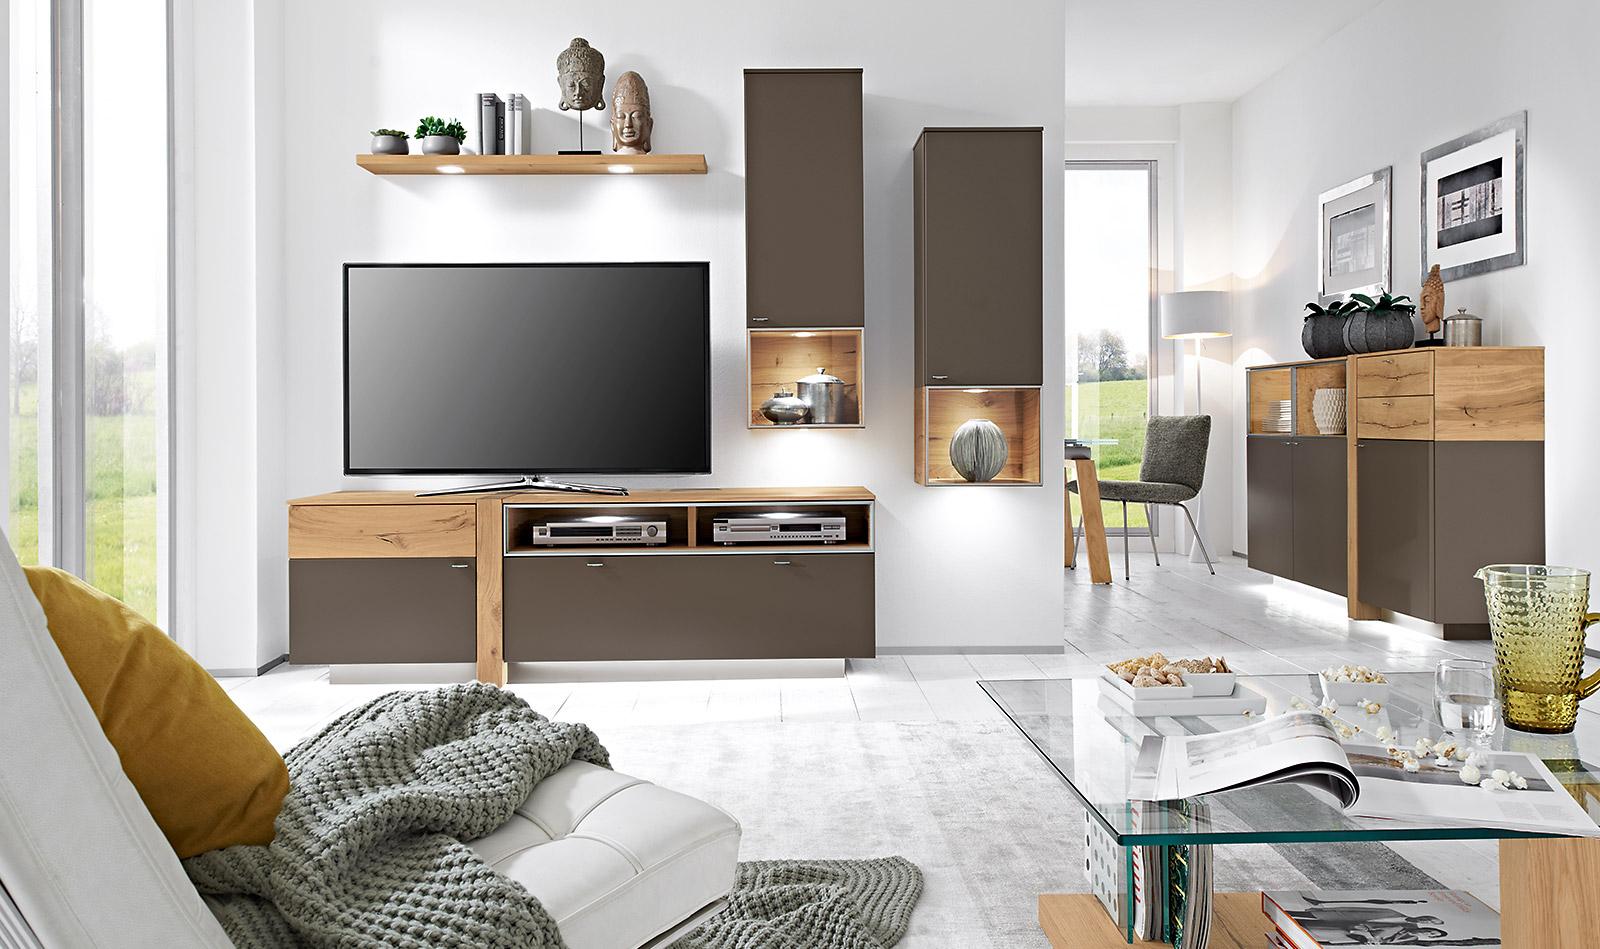 wohnzimmer design programm. Black Bedroom Furniture Sets. Home Design Ideas